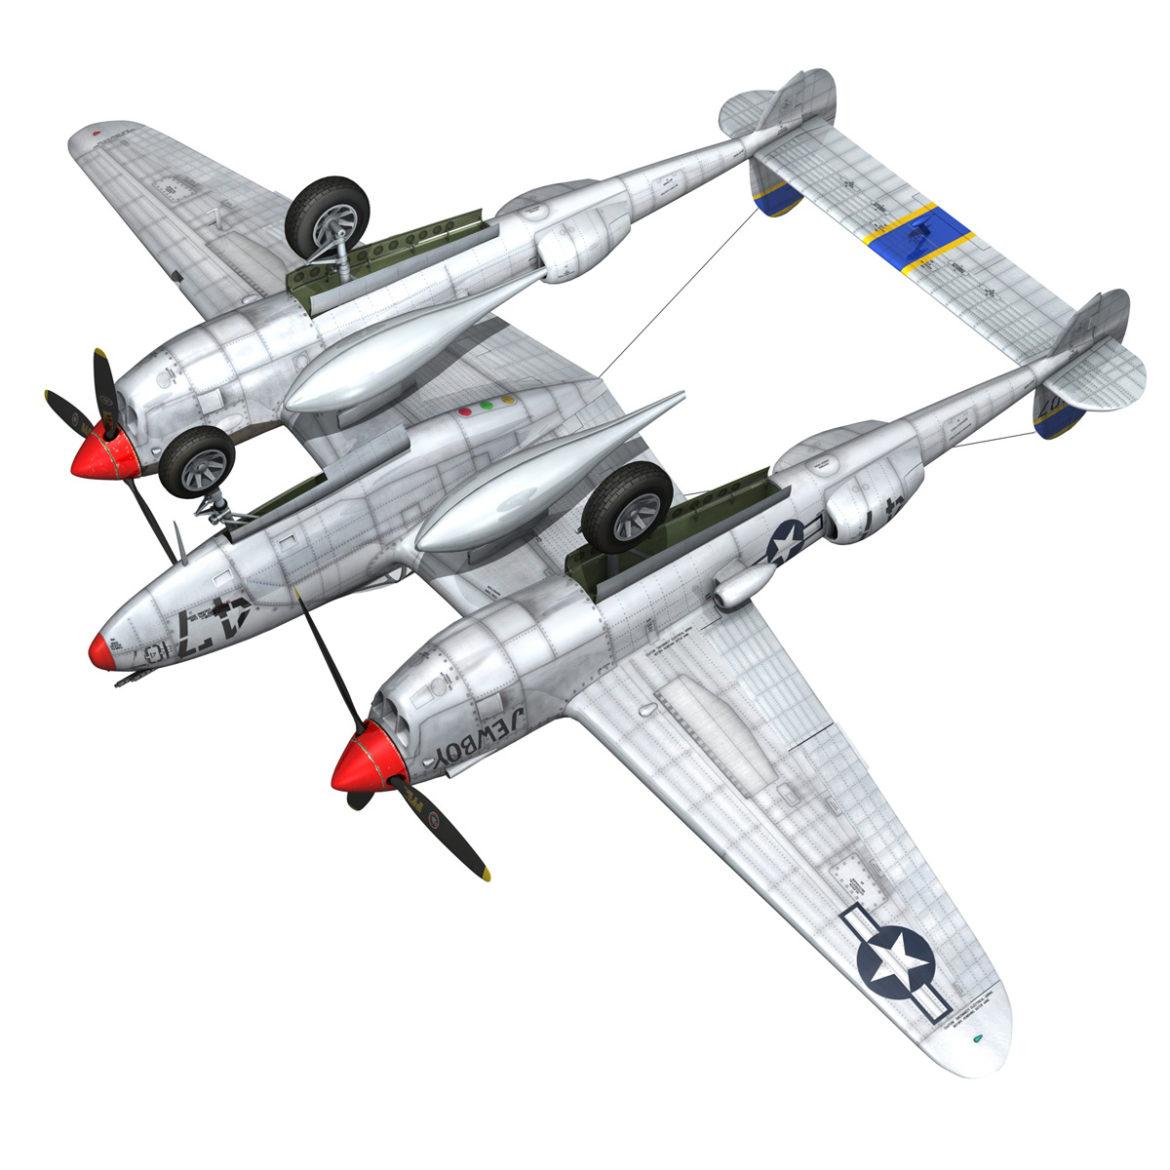 lockheed p-38 lightning – jewboy 3d model fbx c4d lwo obj 295787